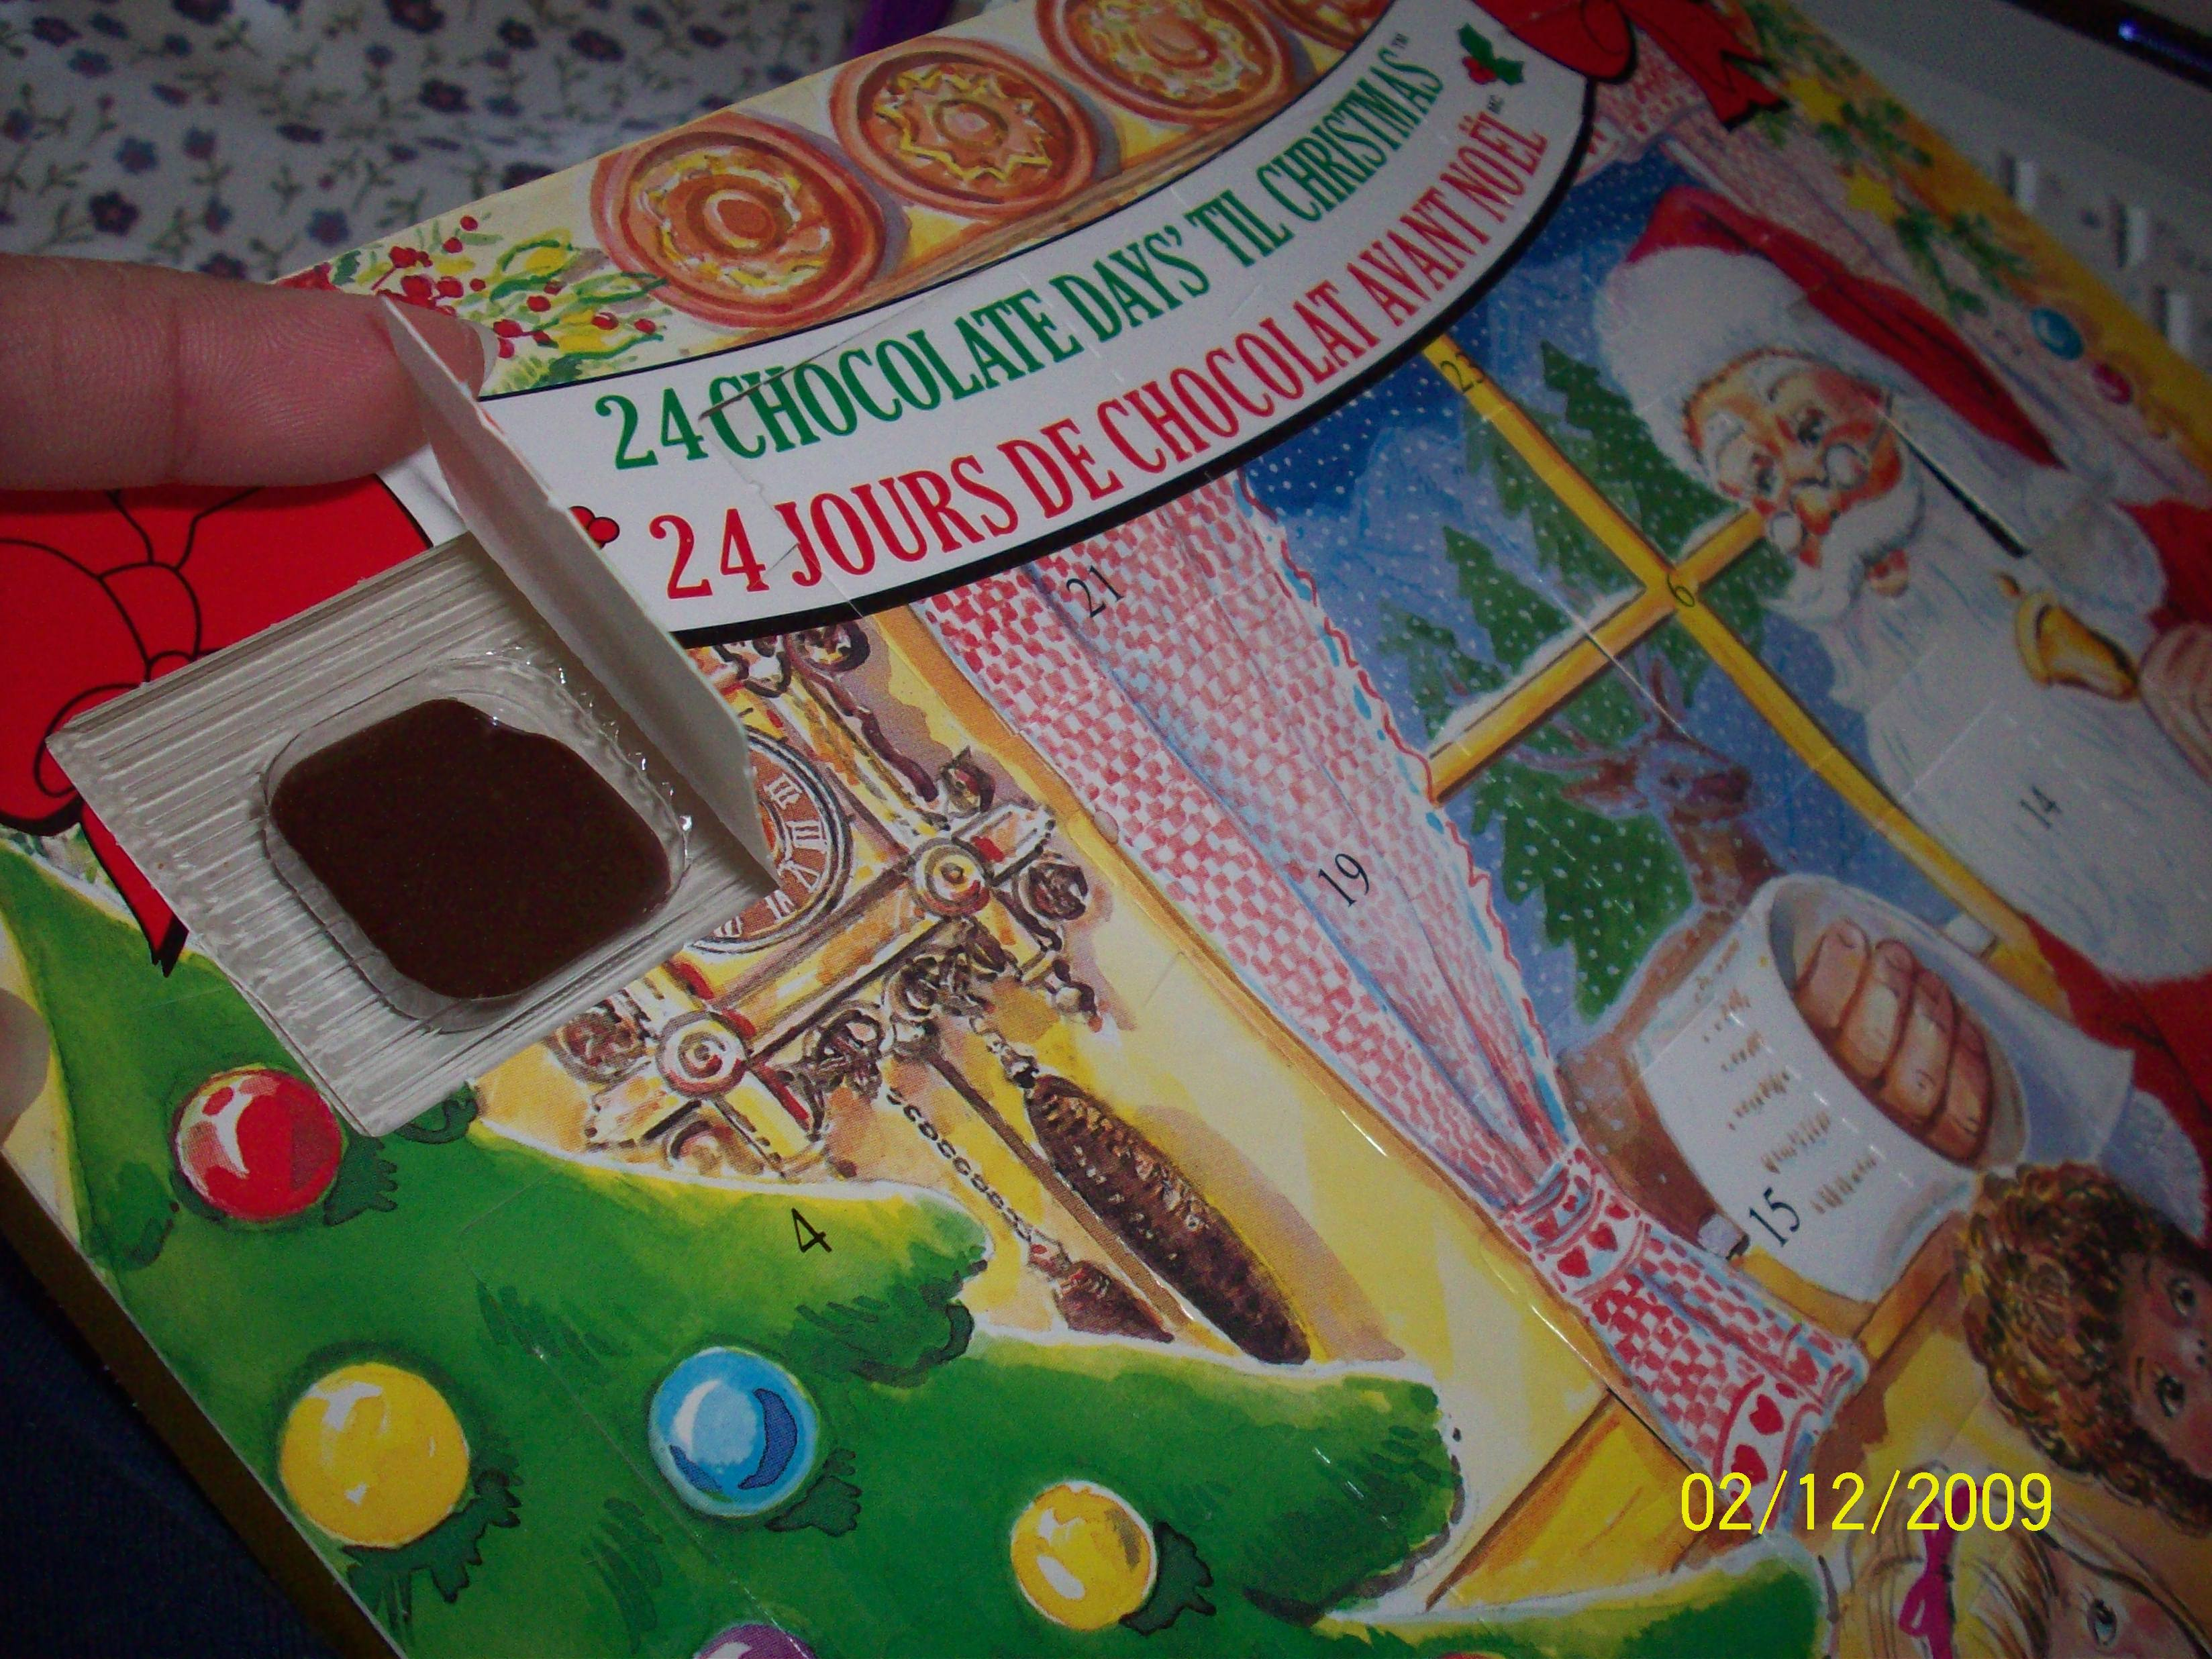 http://foodloader.net/cutie_2009-12-02_Christmas_Chocolates.jpg